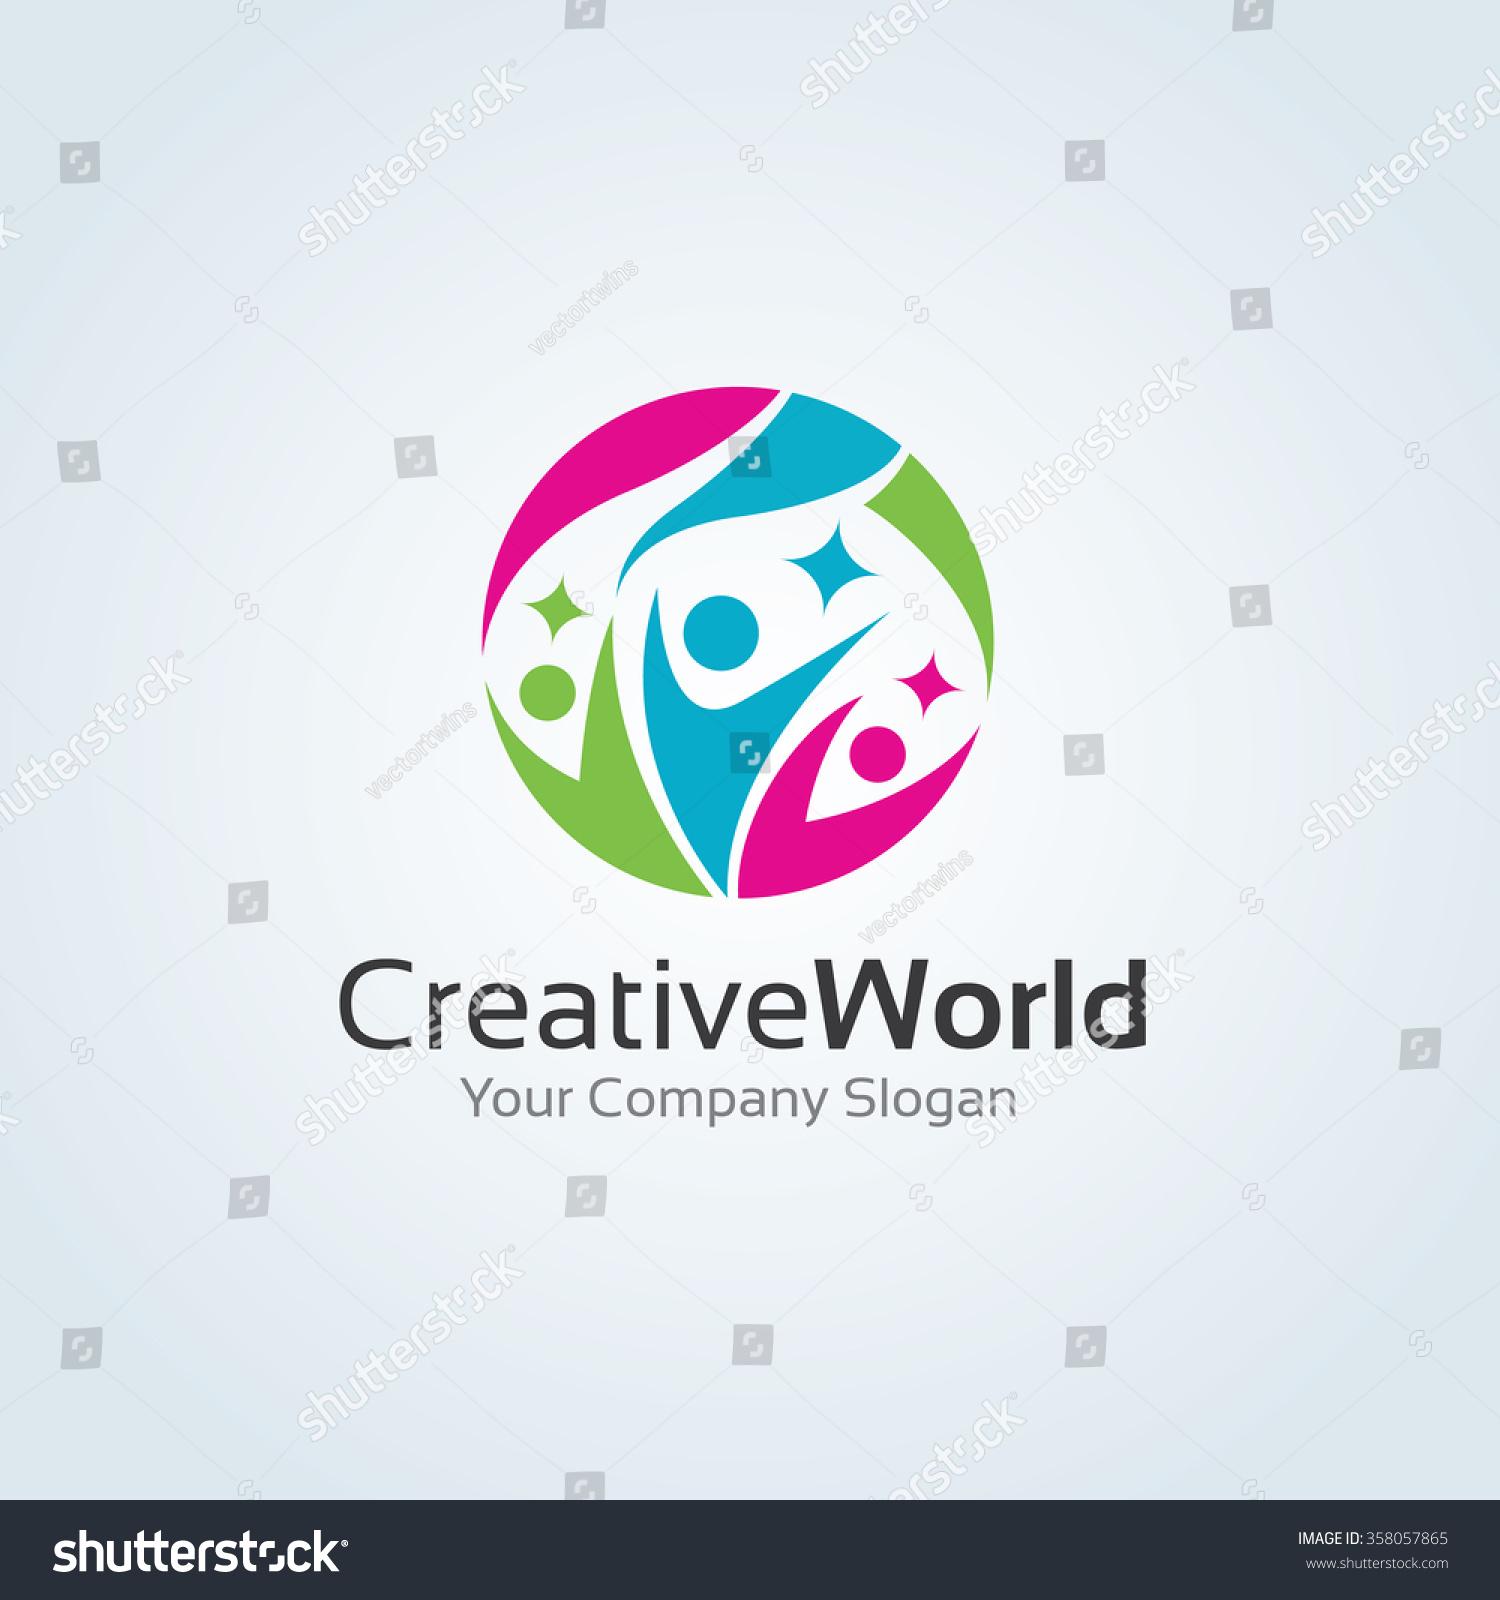 Creative World logo,family logo,world logo,people logo,vector logo ...